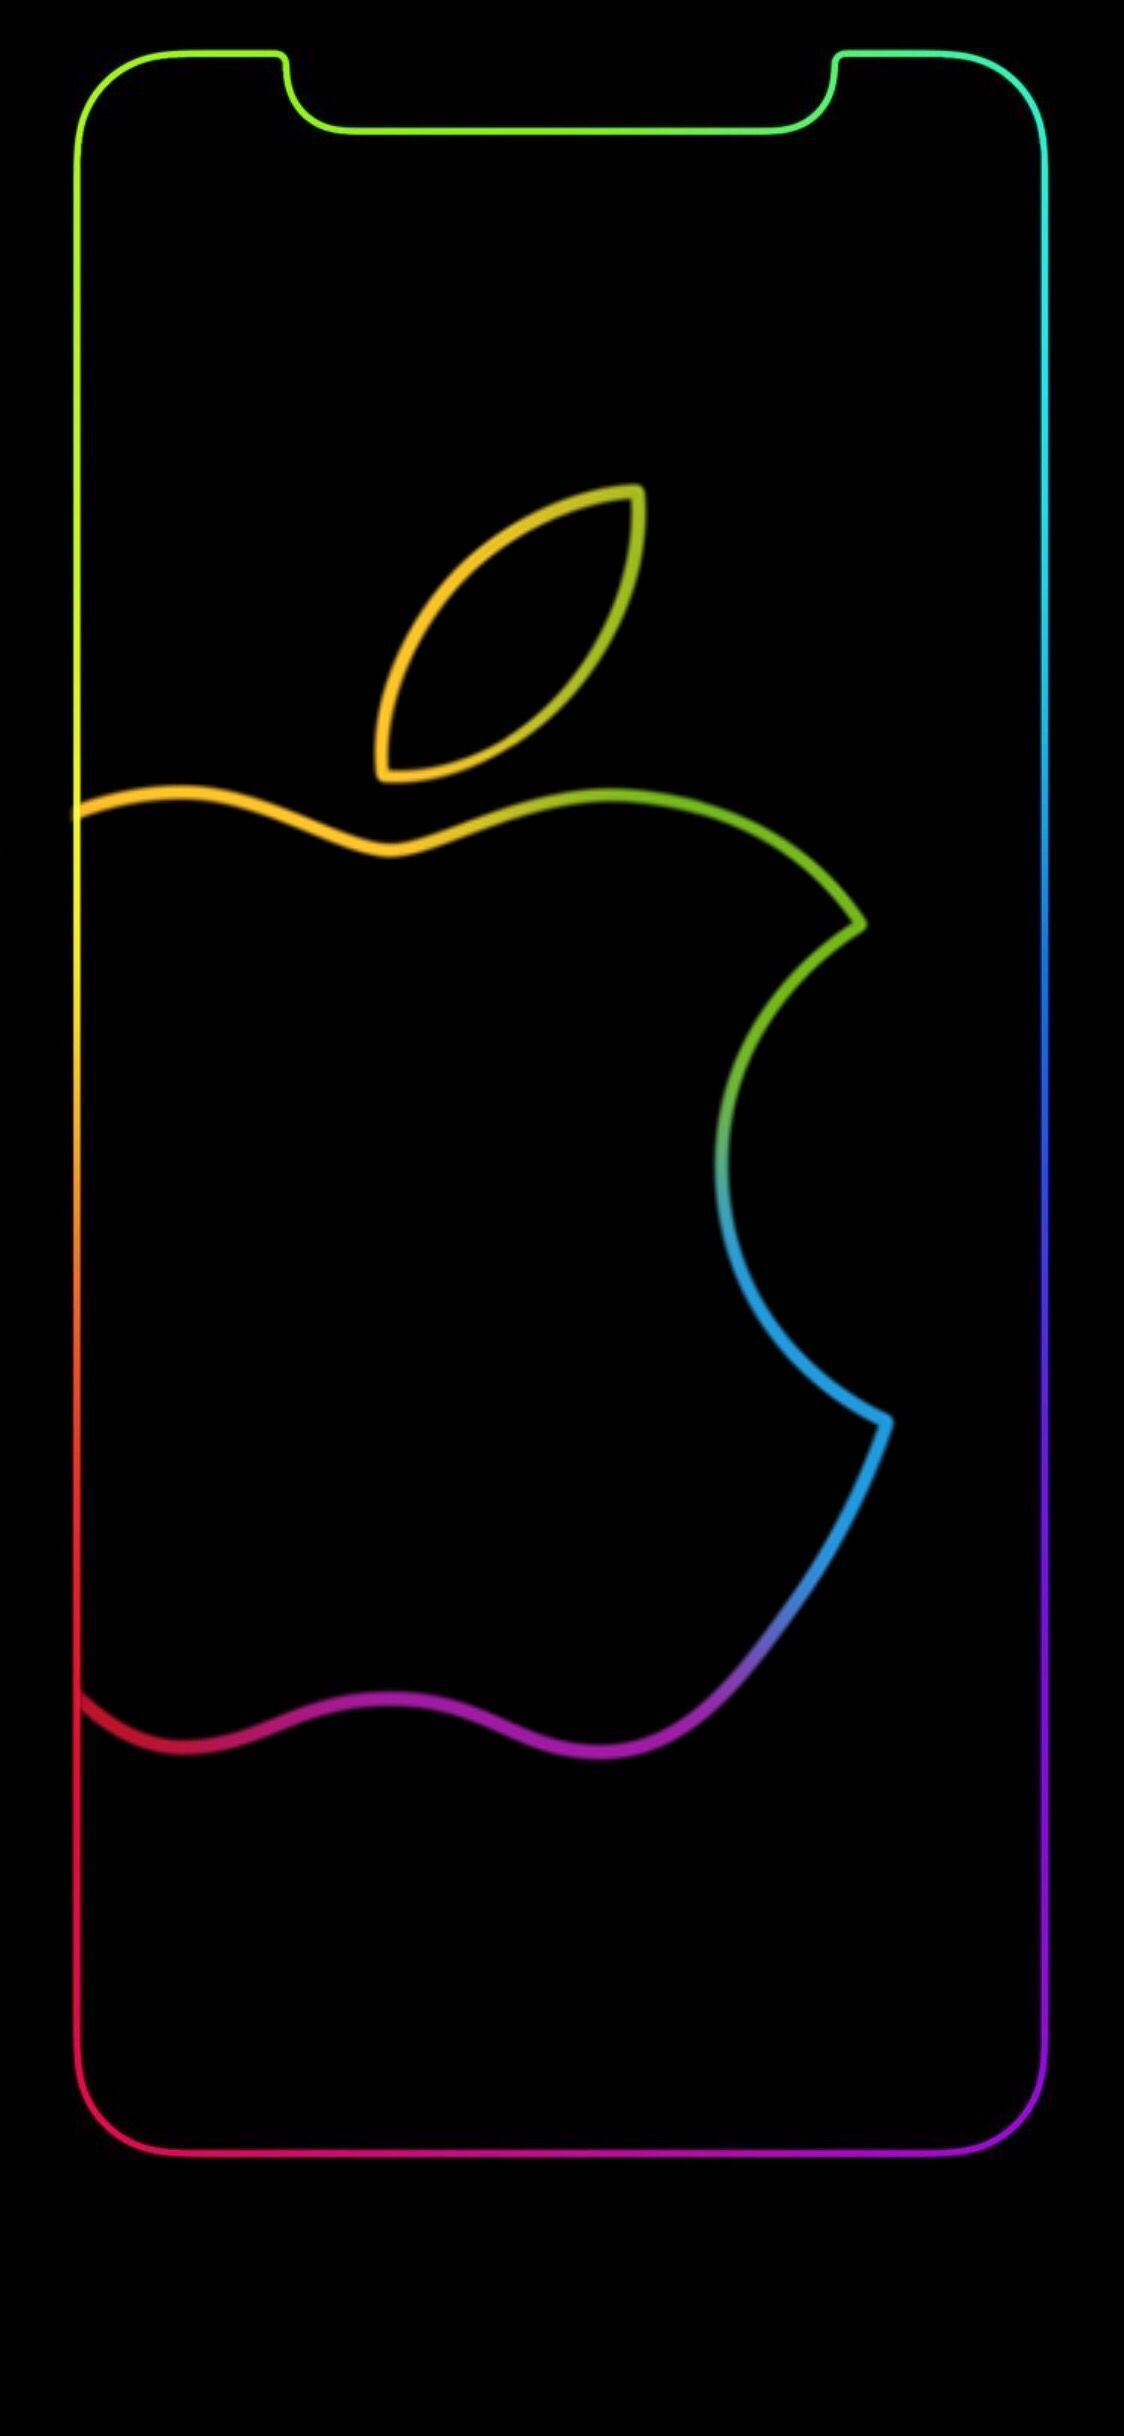 Black Wallpaper iPhone Hypebeast iphone wallpaper Black 1124x2436